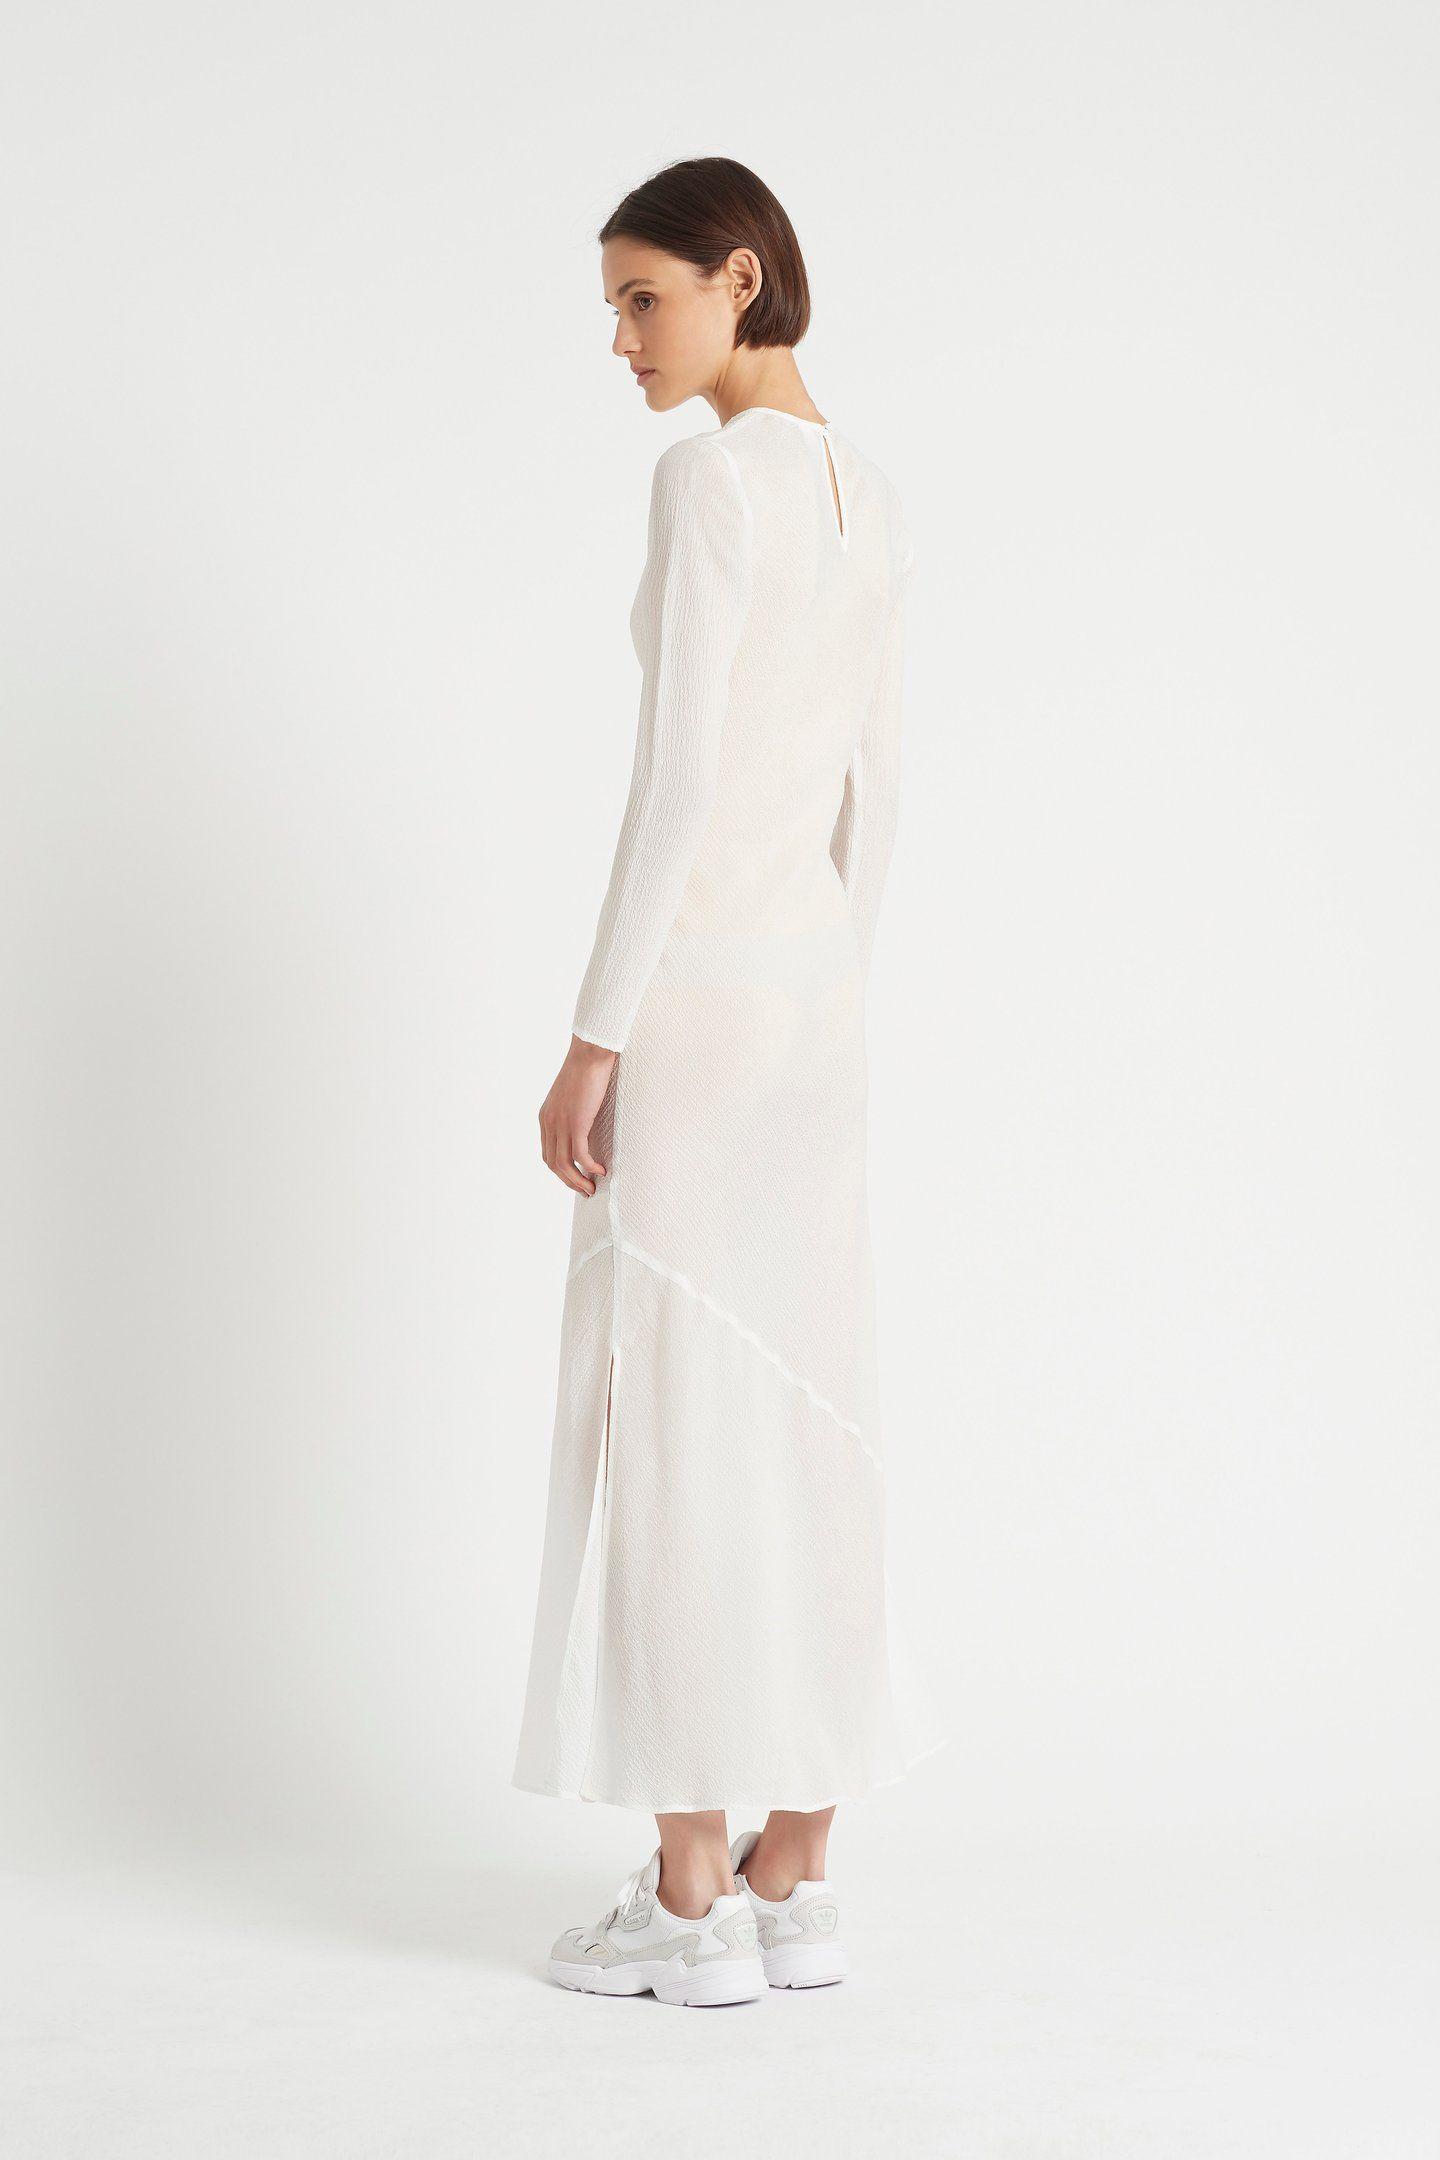 Pin On White Dress [ 2160 x 1440 Pixel ]